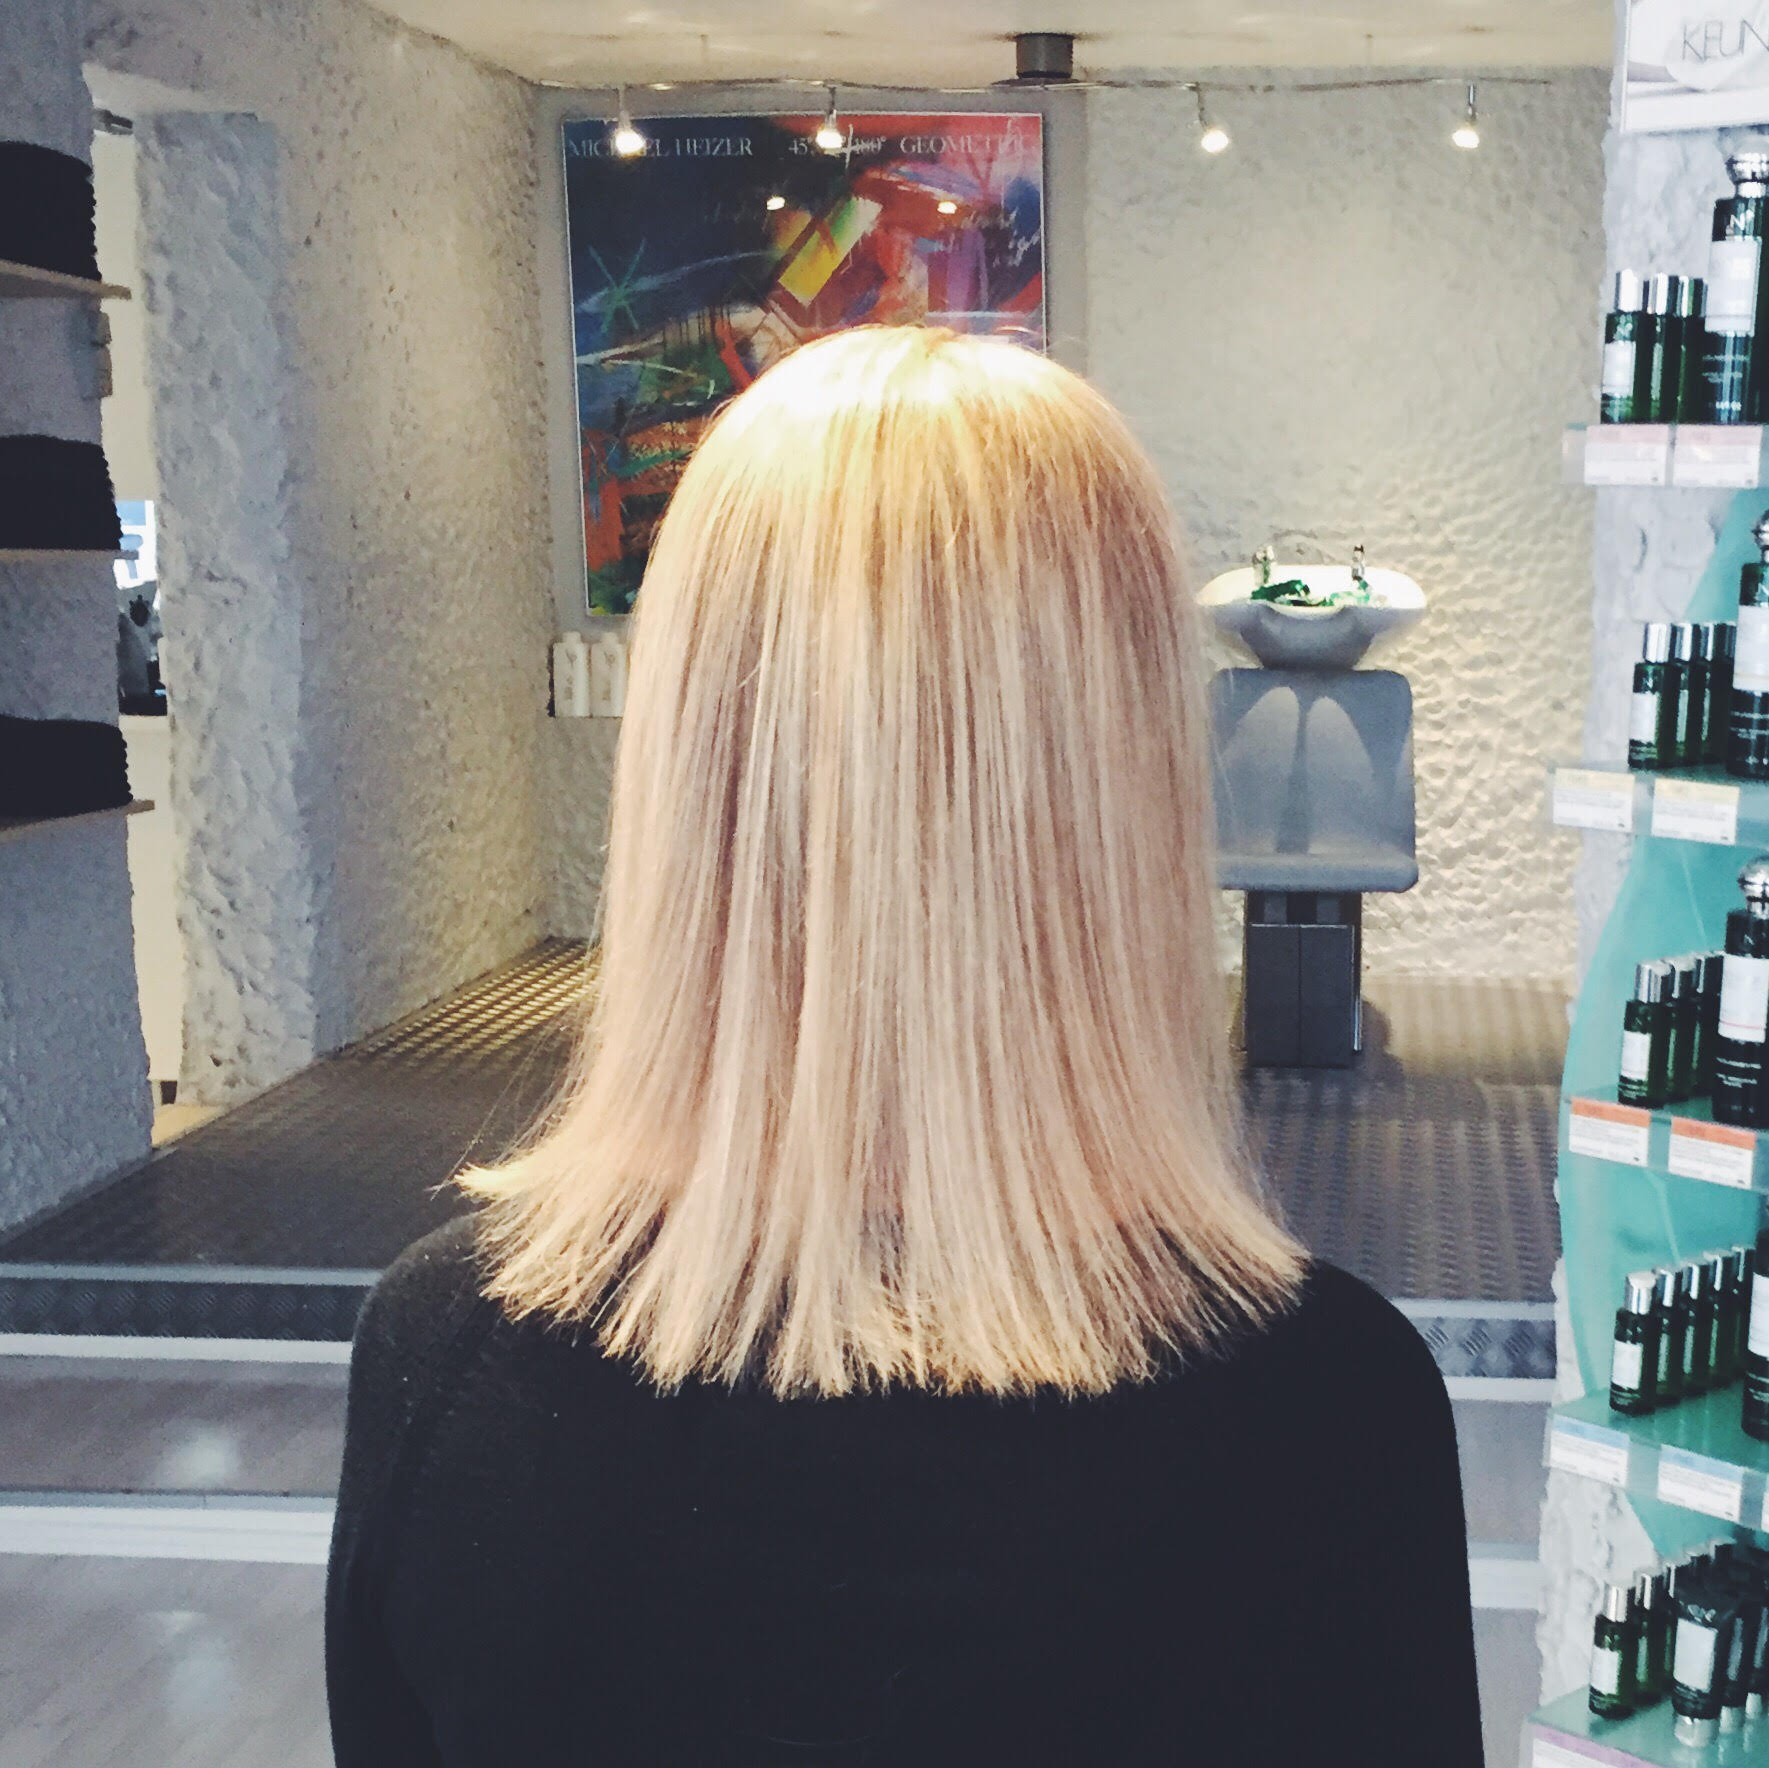 hair studio på Østerbro. Billig klipning og lyse striber. Frisør